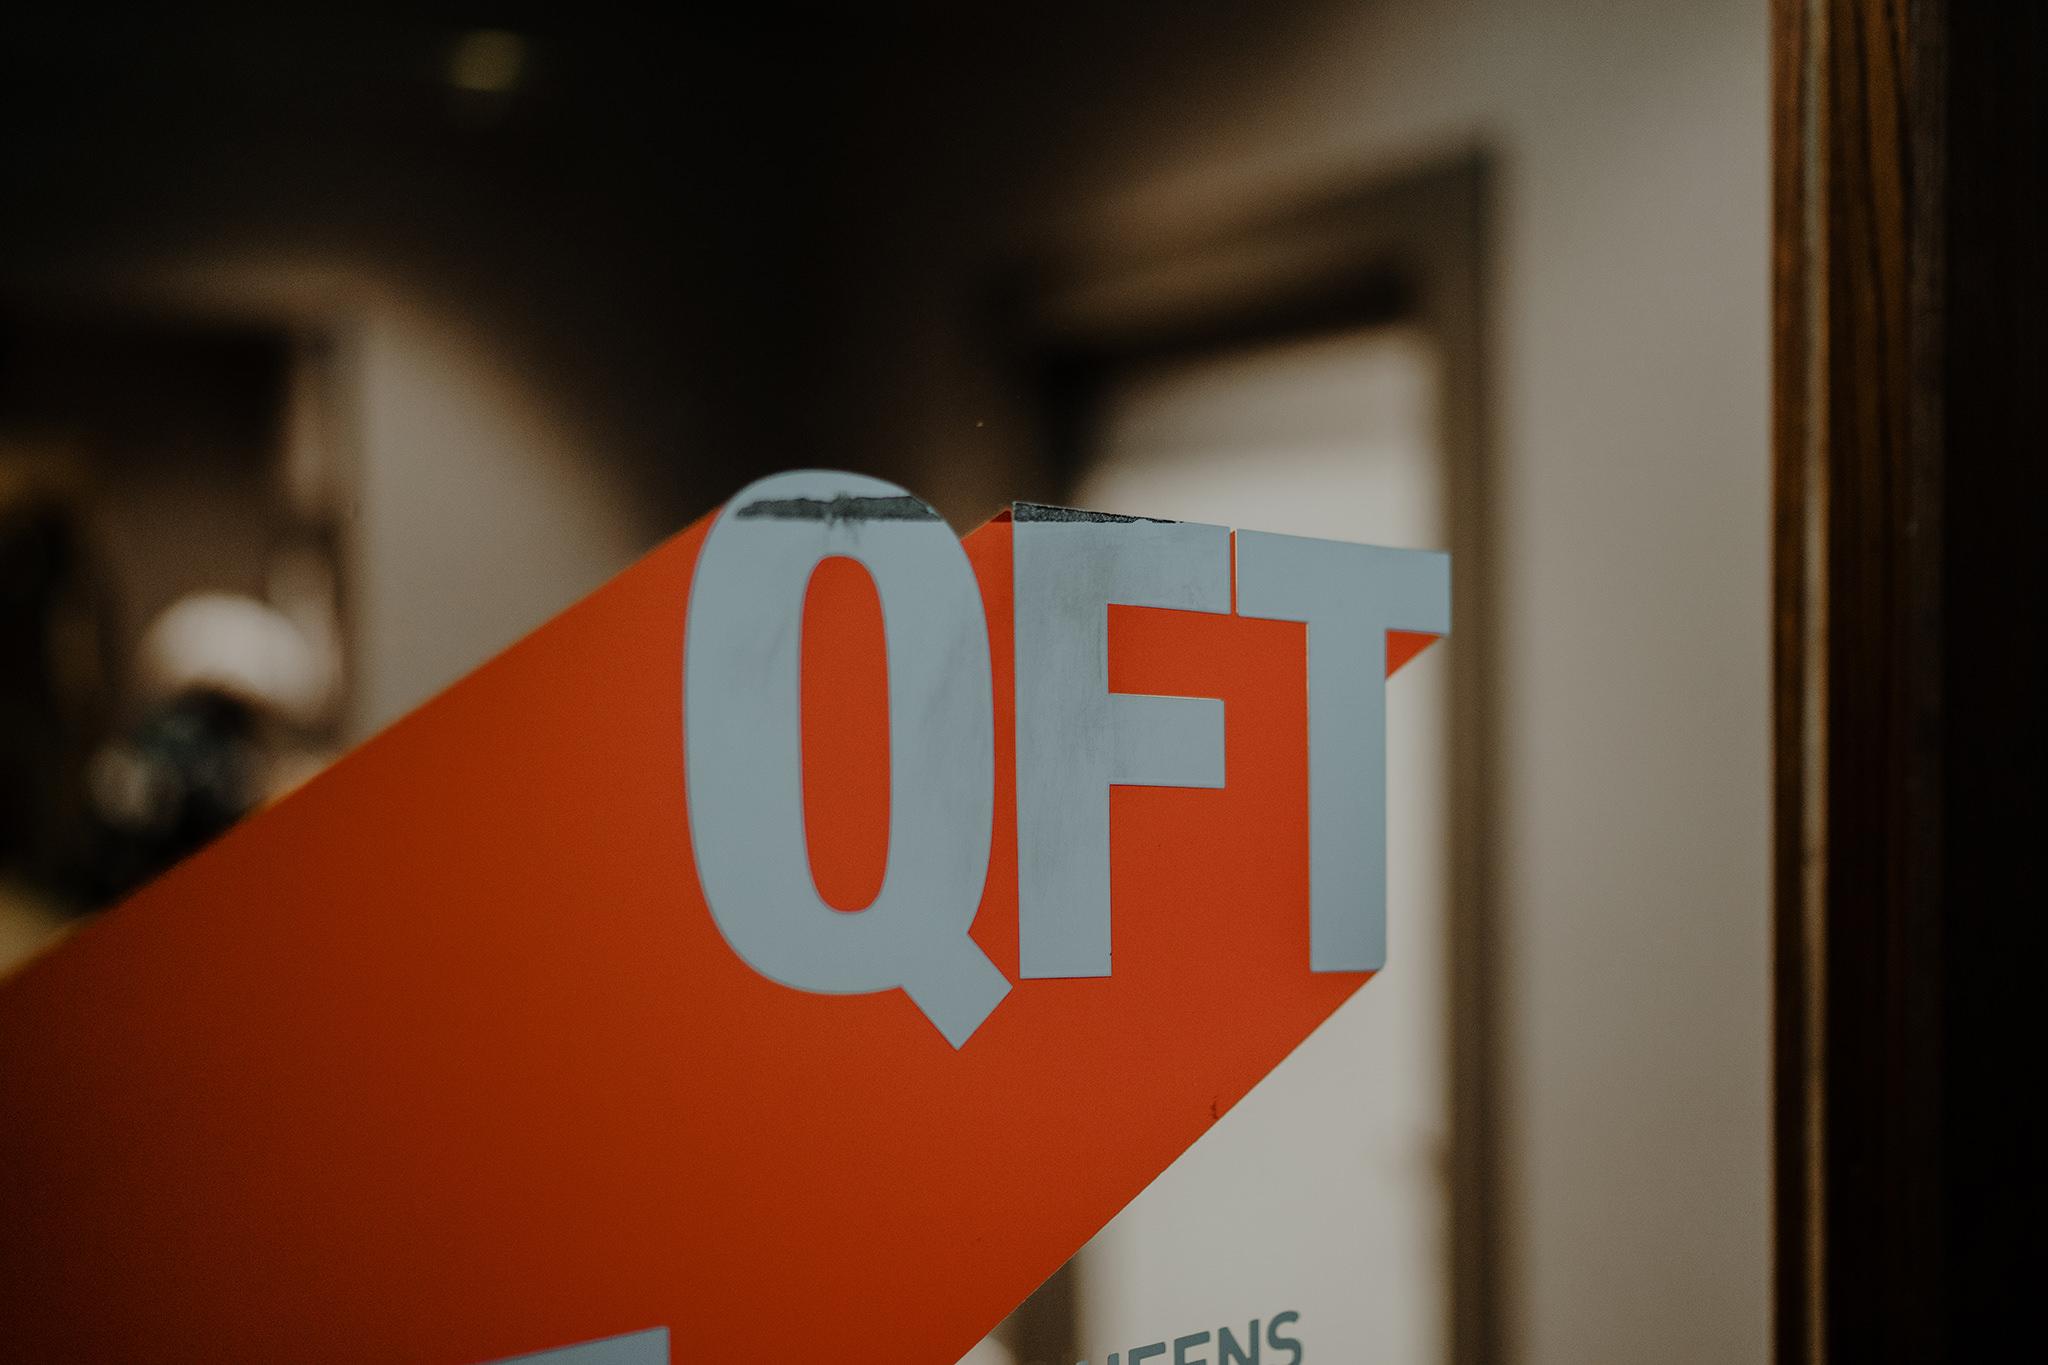 qft-E+T-belfast-city-centre-7.jpg